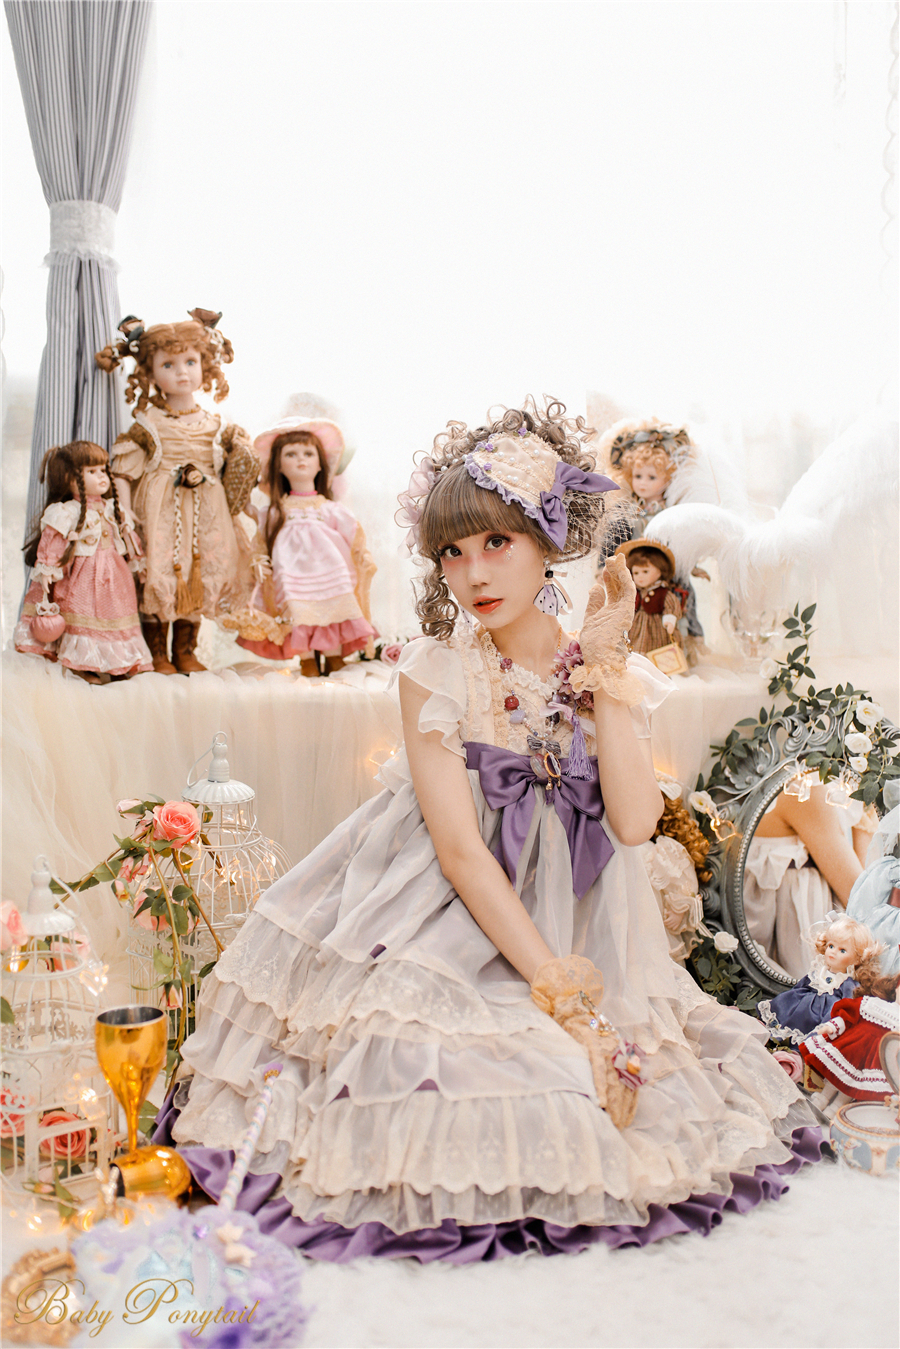 Babyponytail_Model Photo_Present Angel_JSK Violet_2_Kaka_09.jpg